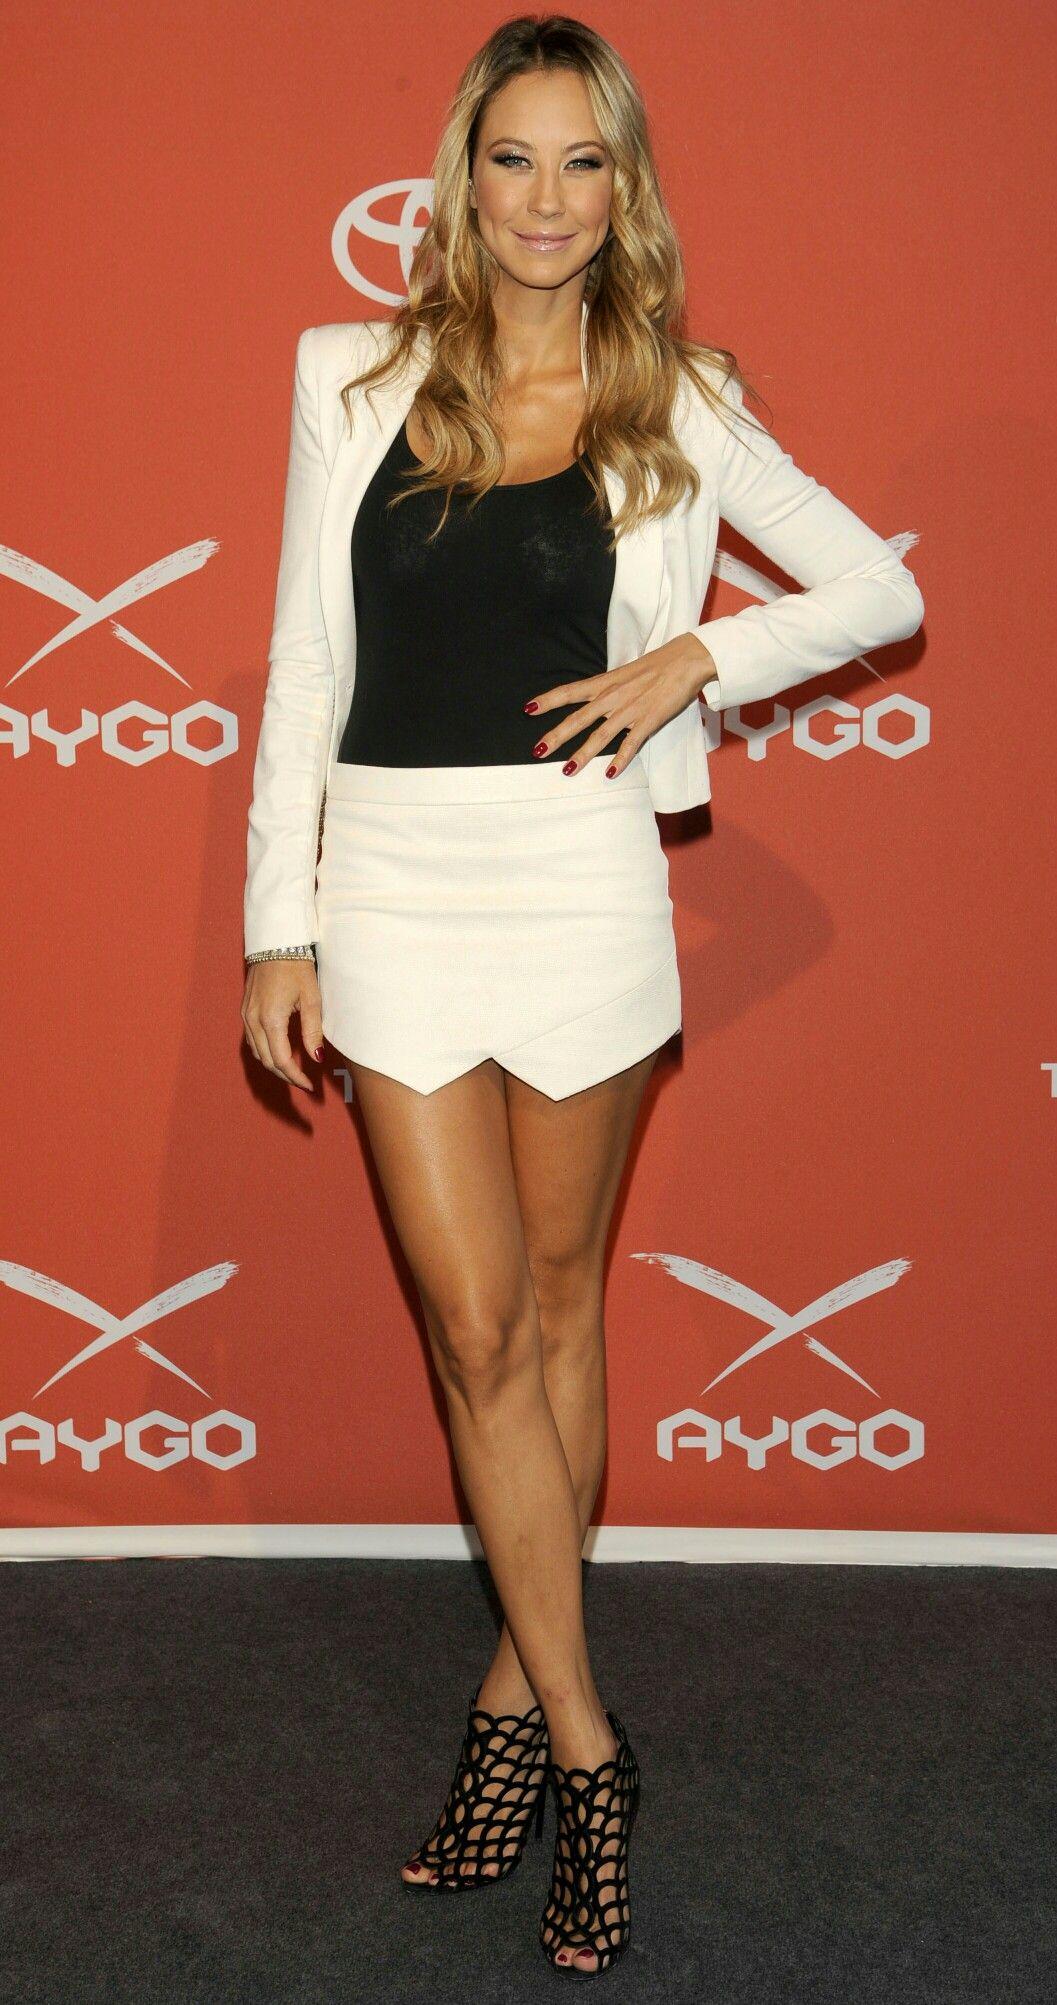 Alessandra meyer-wölden bikini